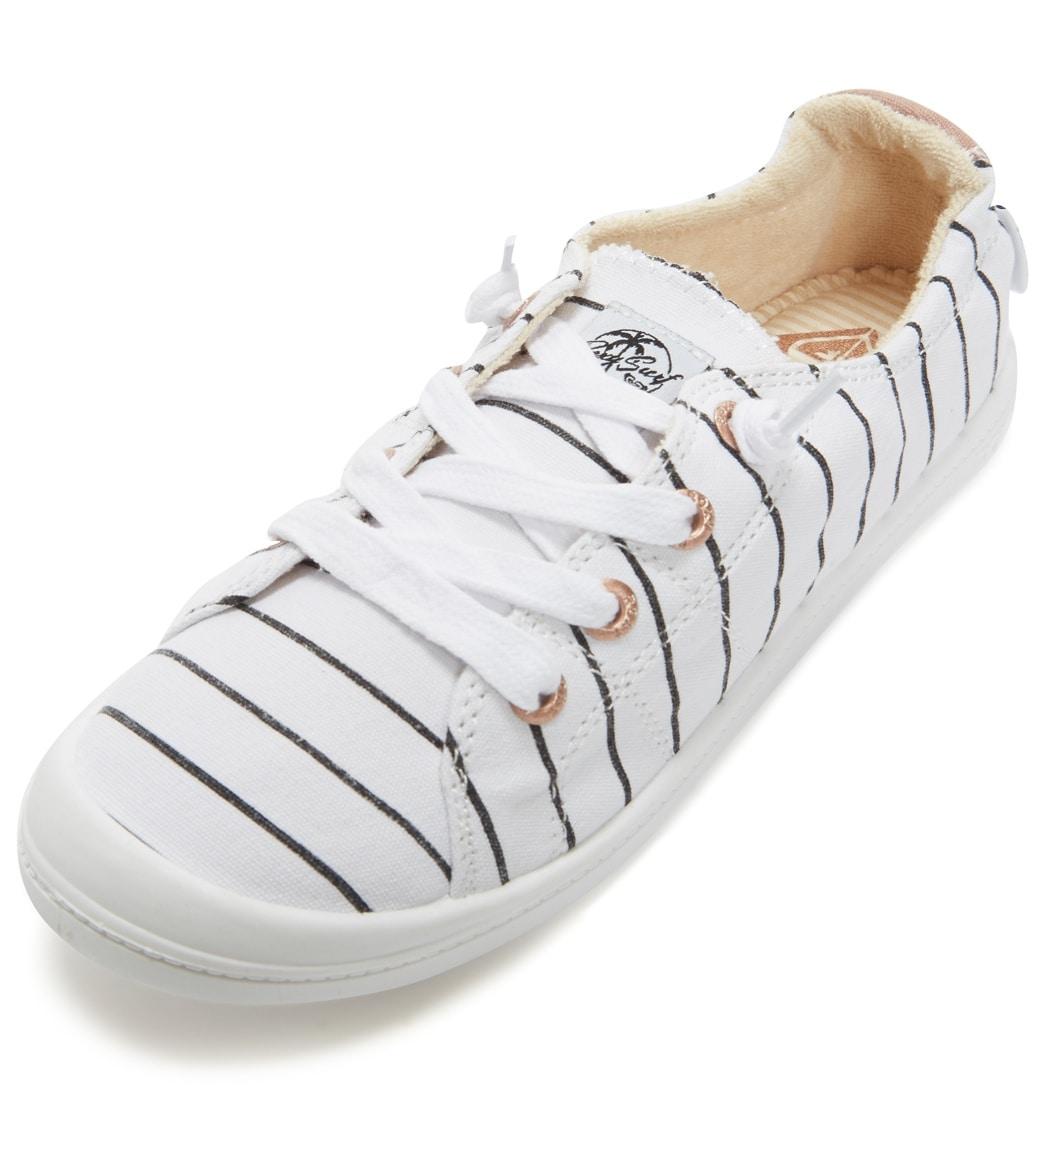 mizuno volleyball shoes hawaii usa today